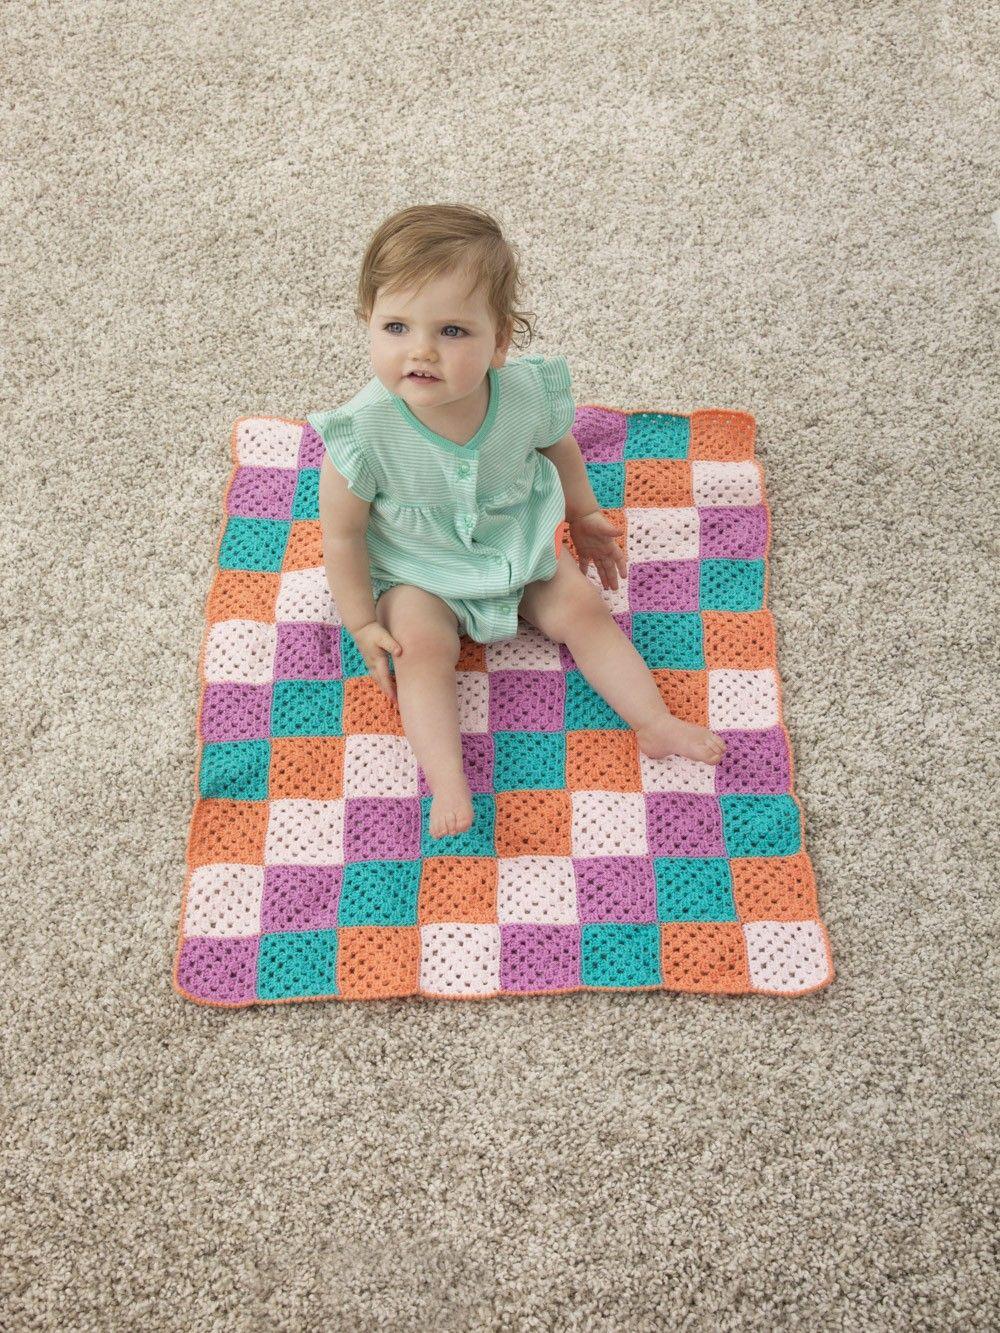 Garden Path Afghan (Crochet) - Patterns - Lion Brand Yarn | TEJIDOS ...